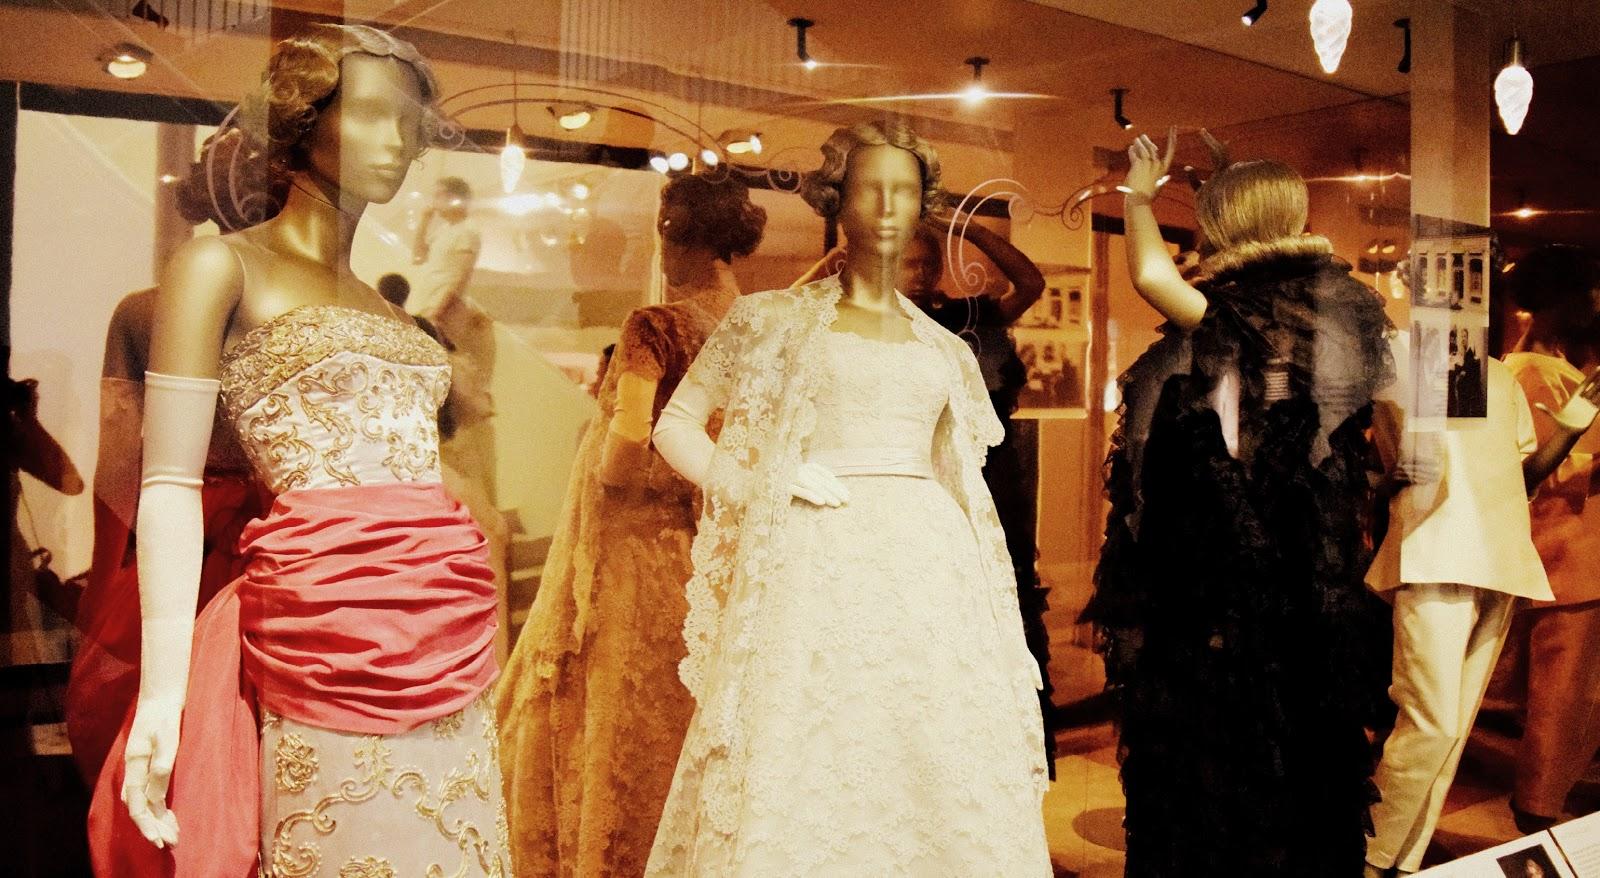 Balenciaga Shaping Fashion exhibition in London review